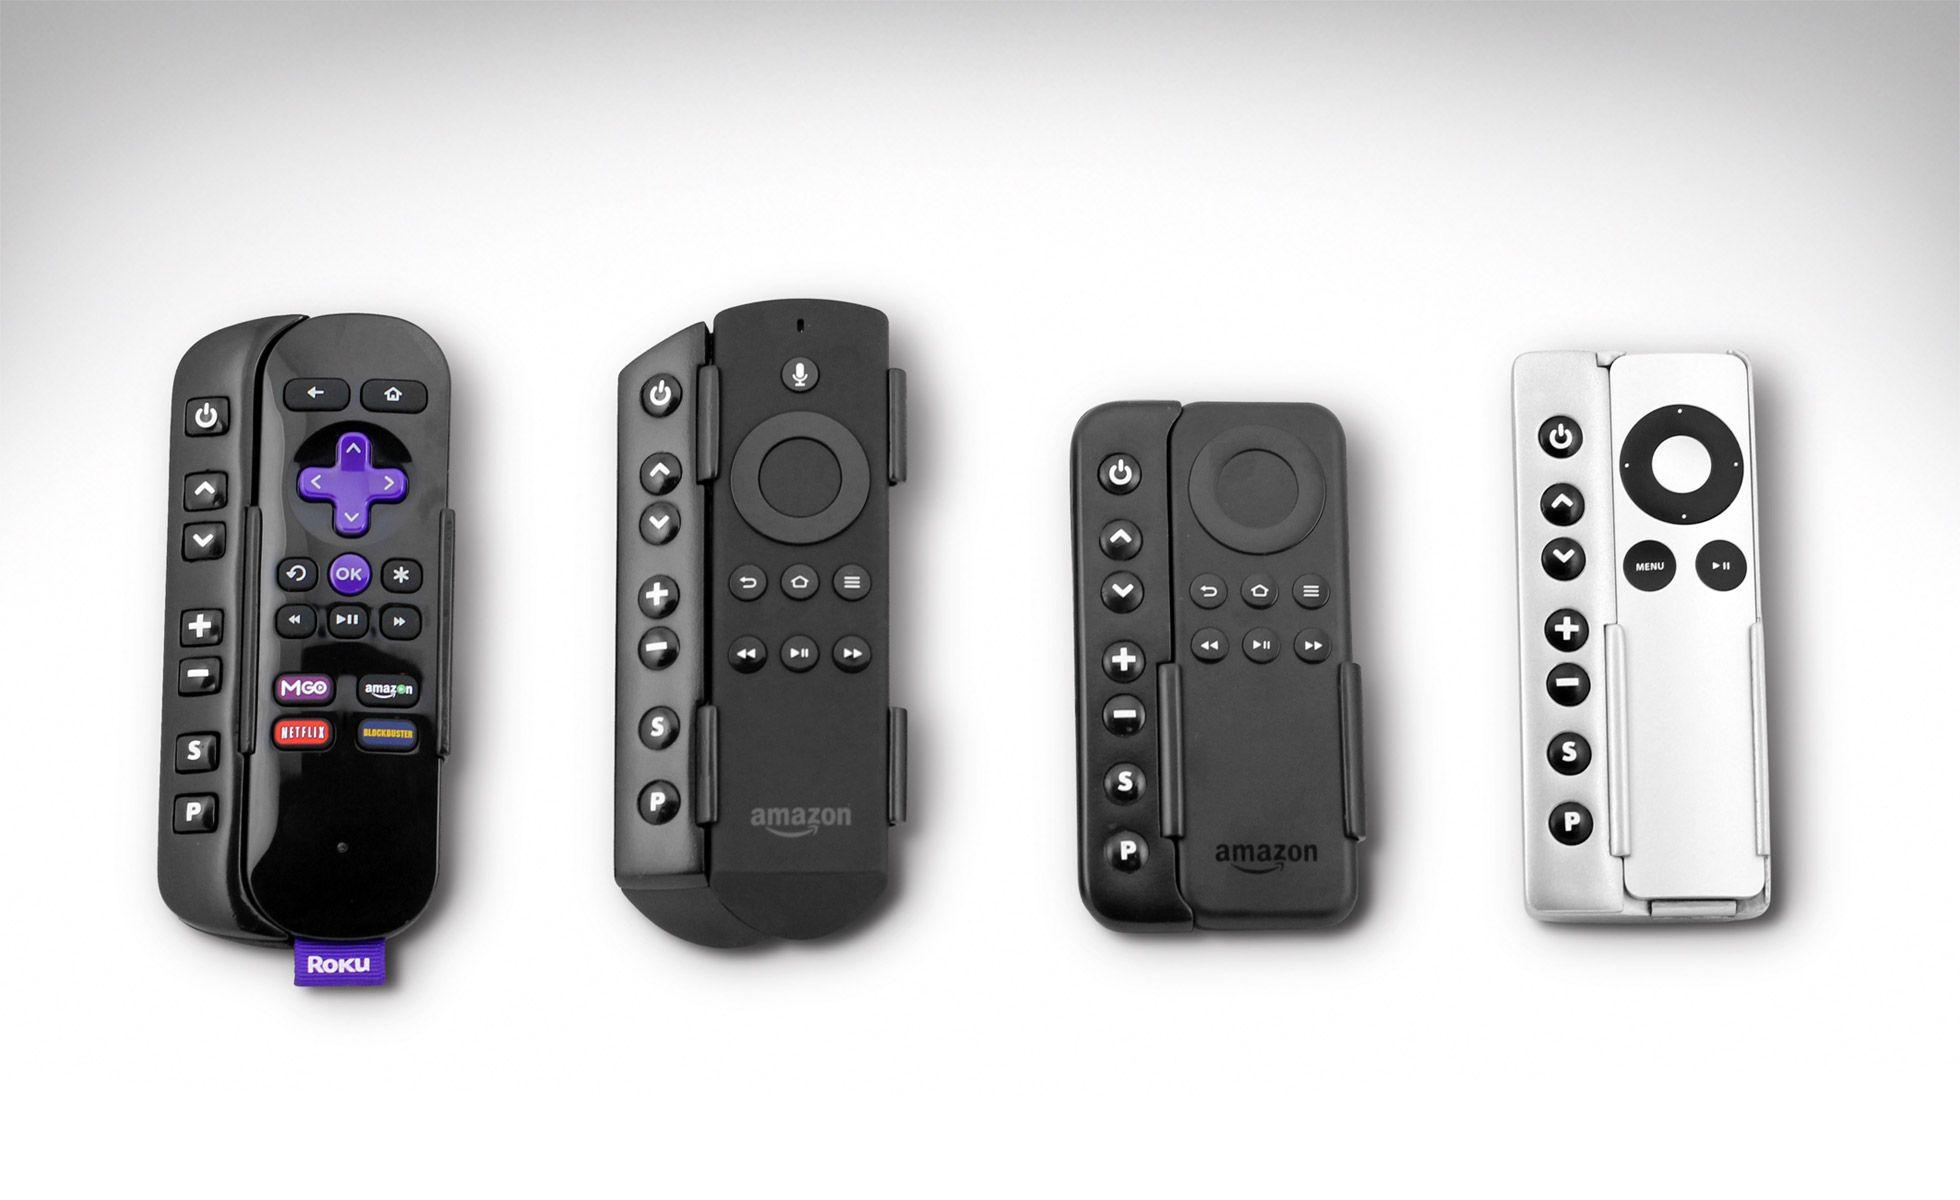 Sideclick remote